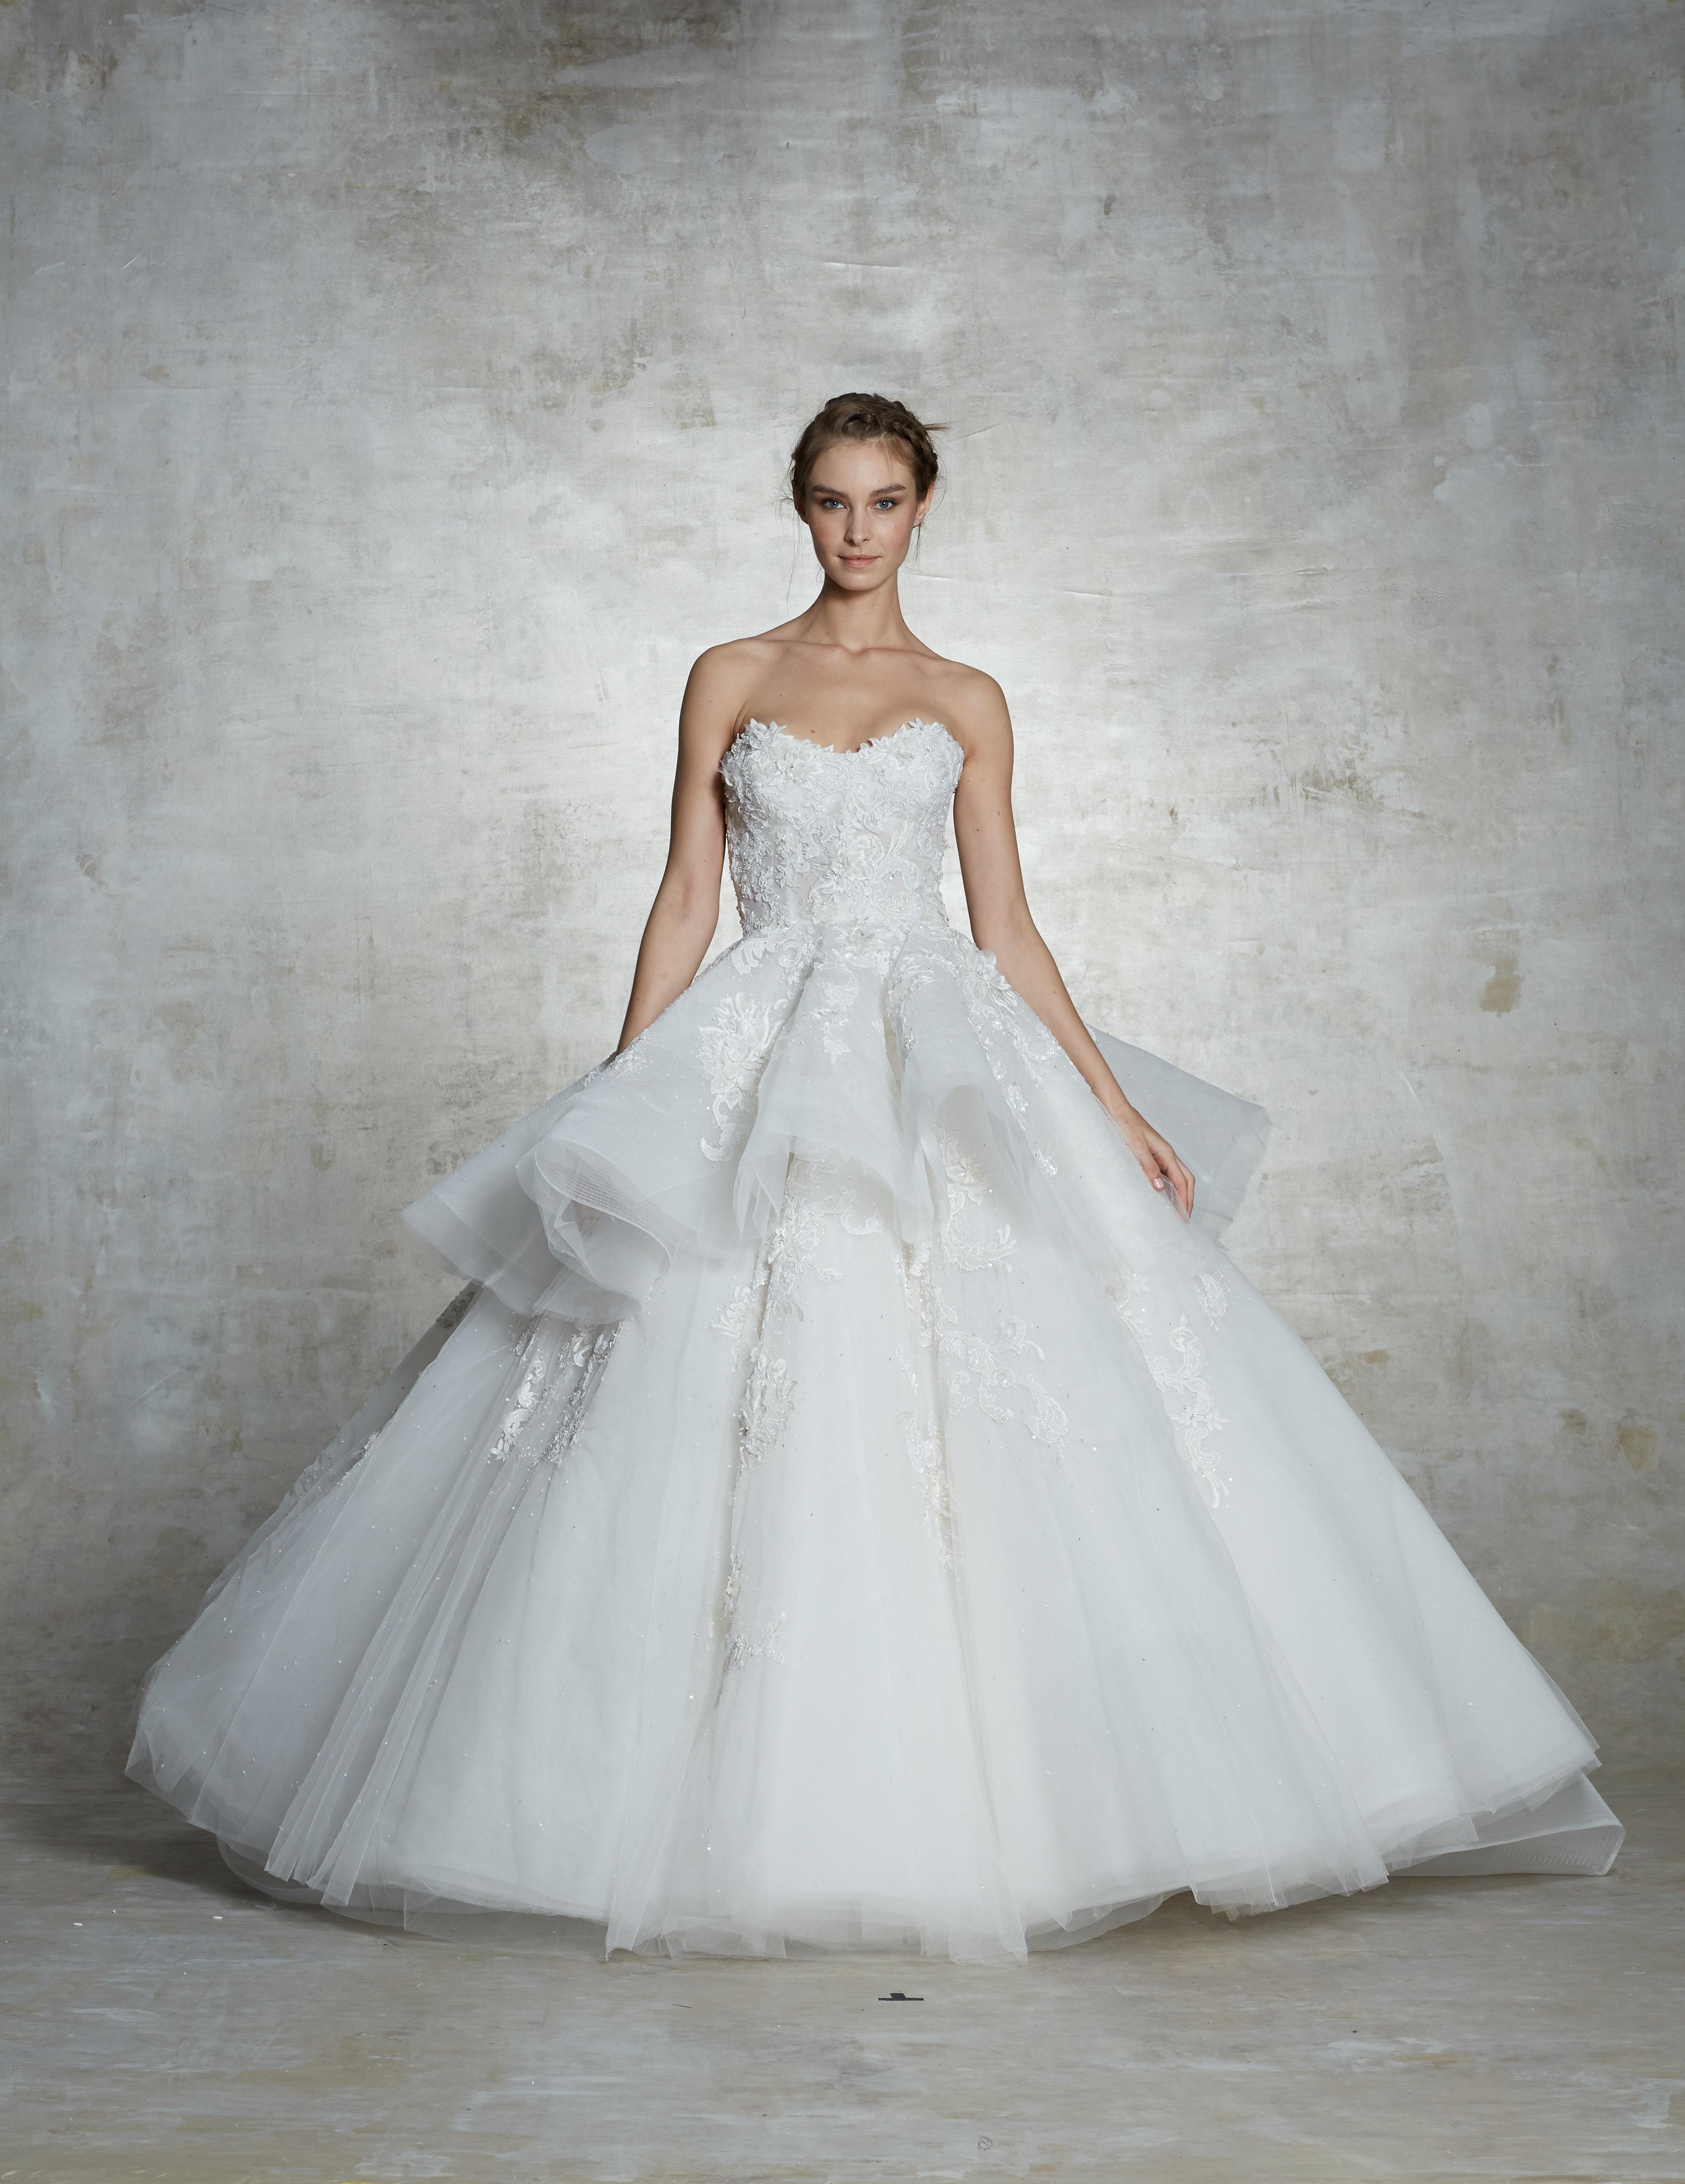 3e750e447cfa White By Vera Wang Wedding Dress With Rosettes - raveitsafe